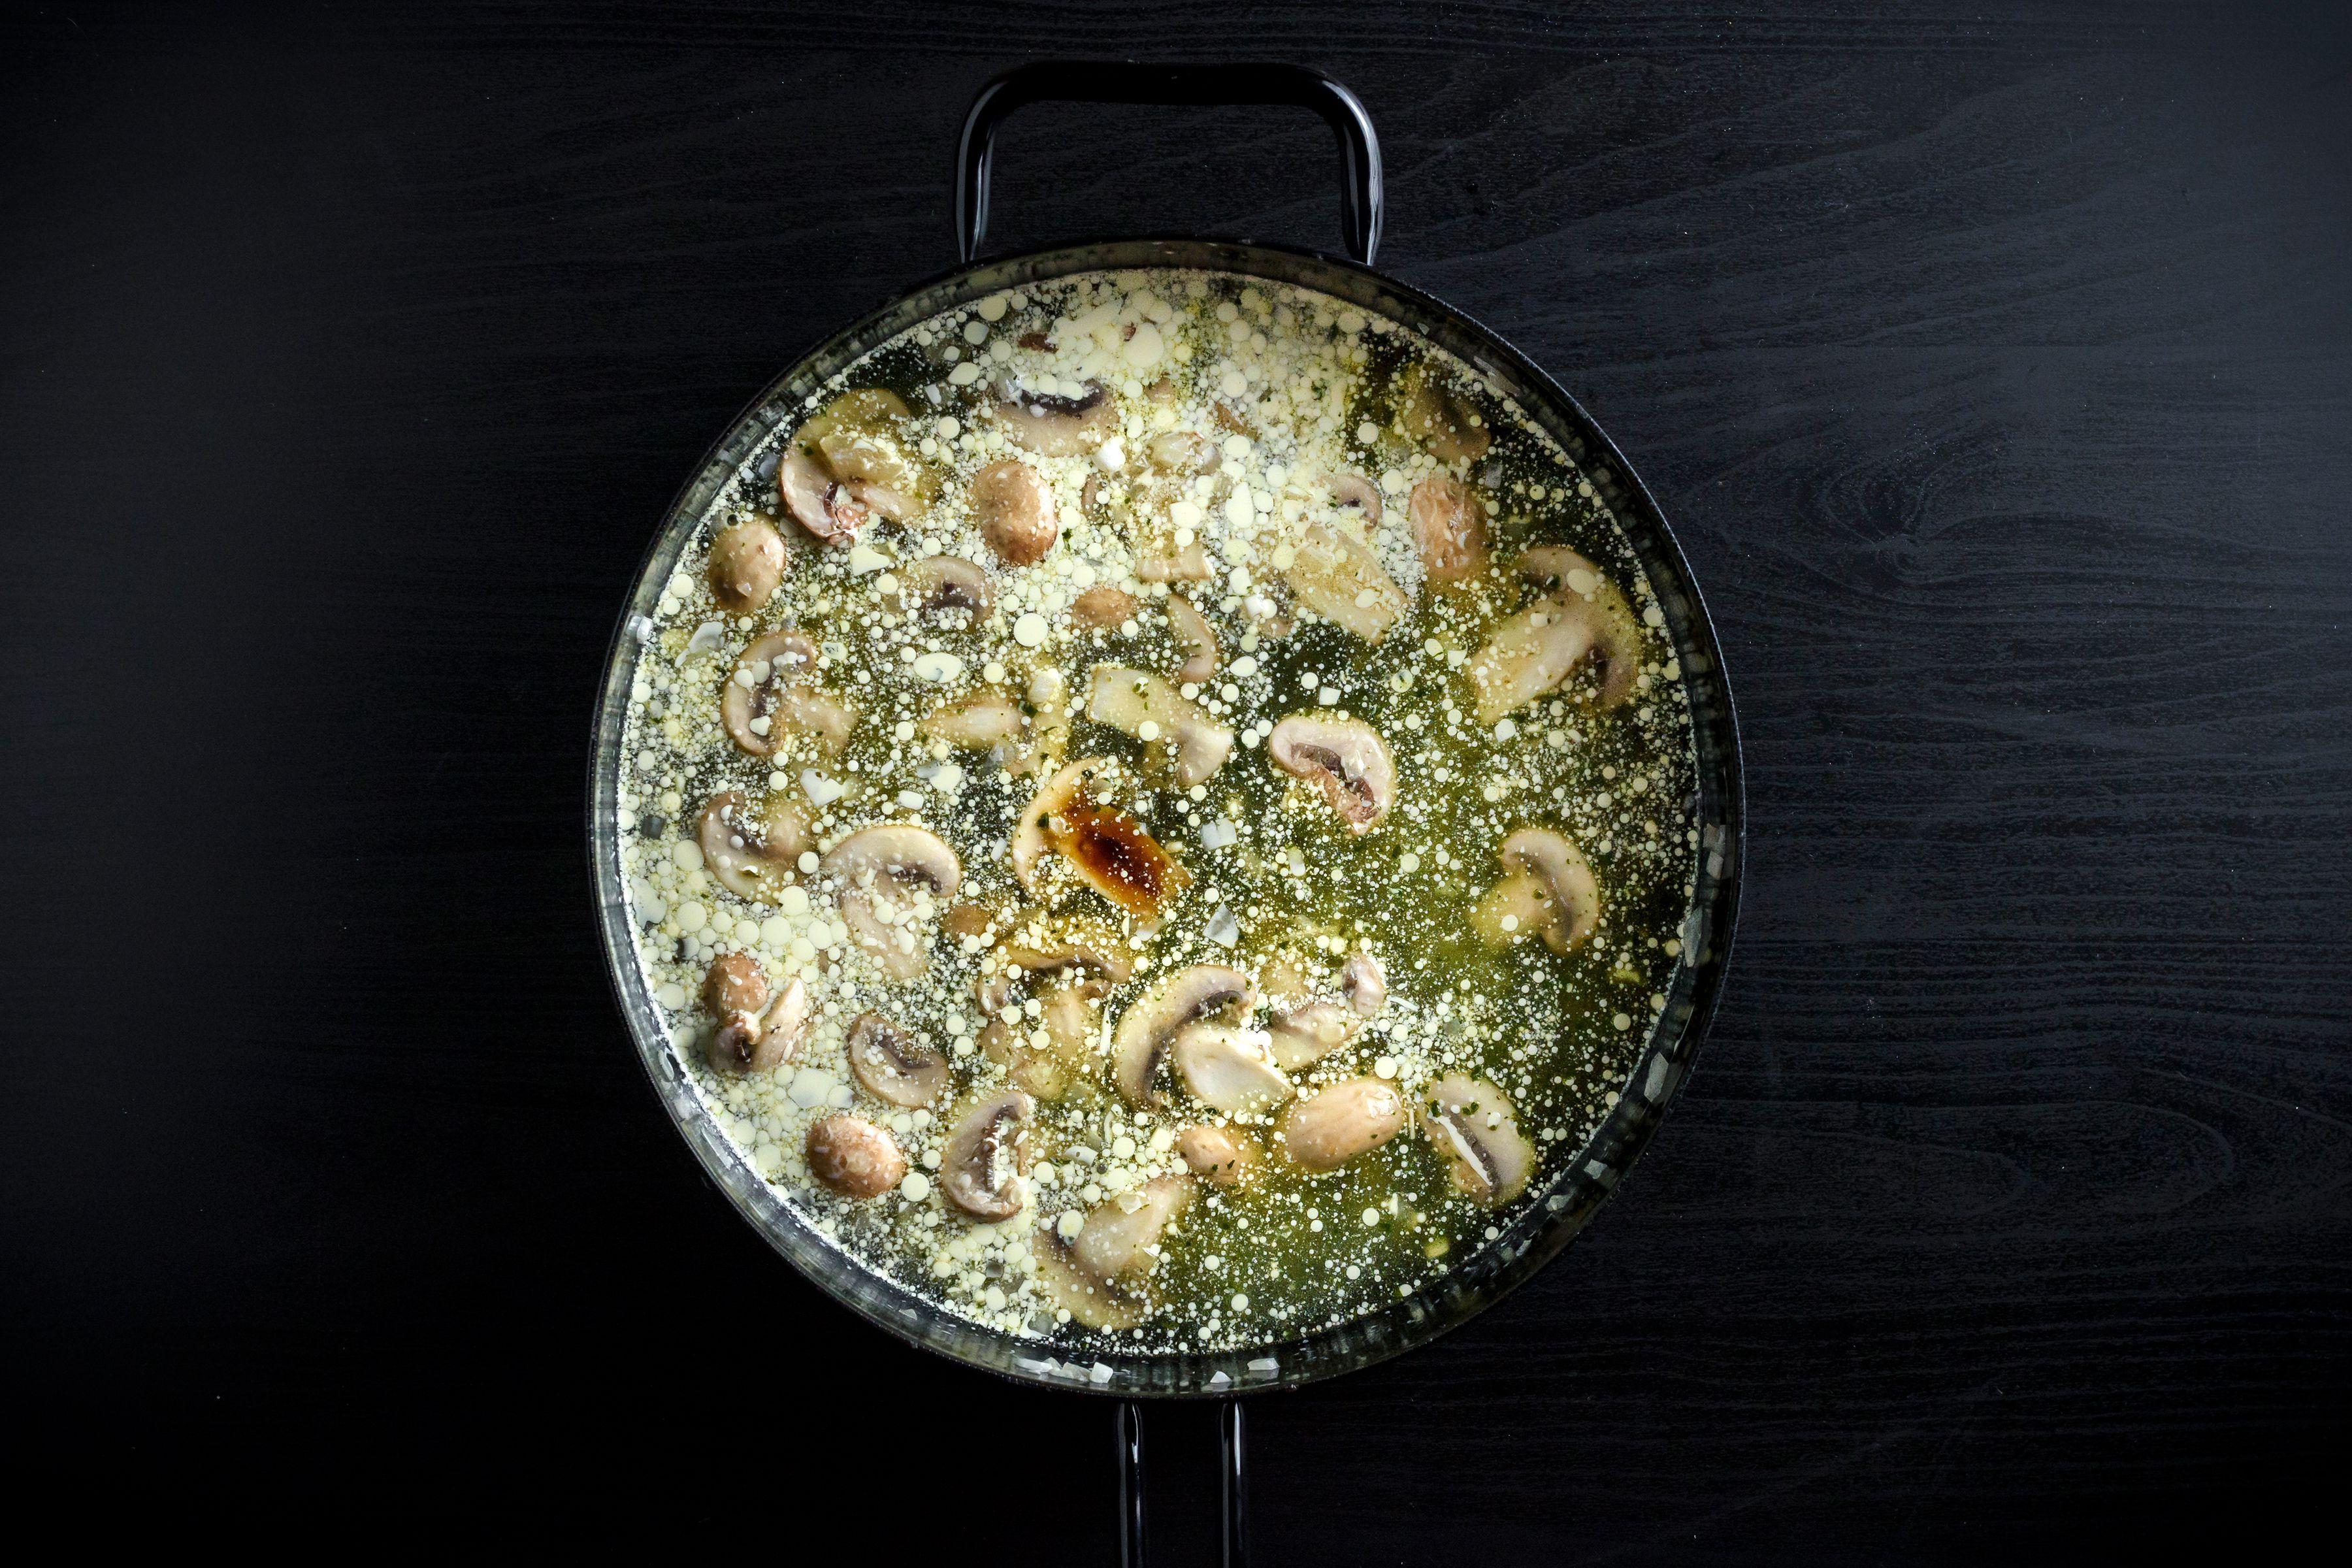 Mushroom gravy broth in pan